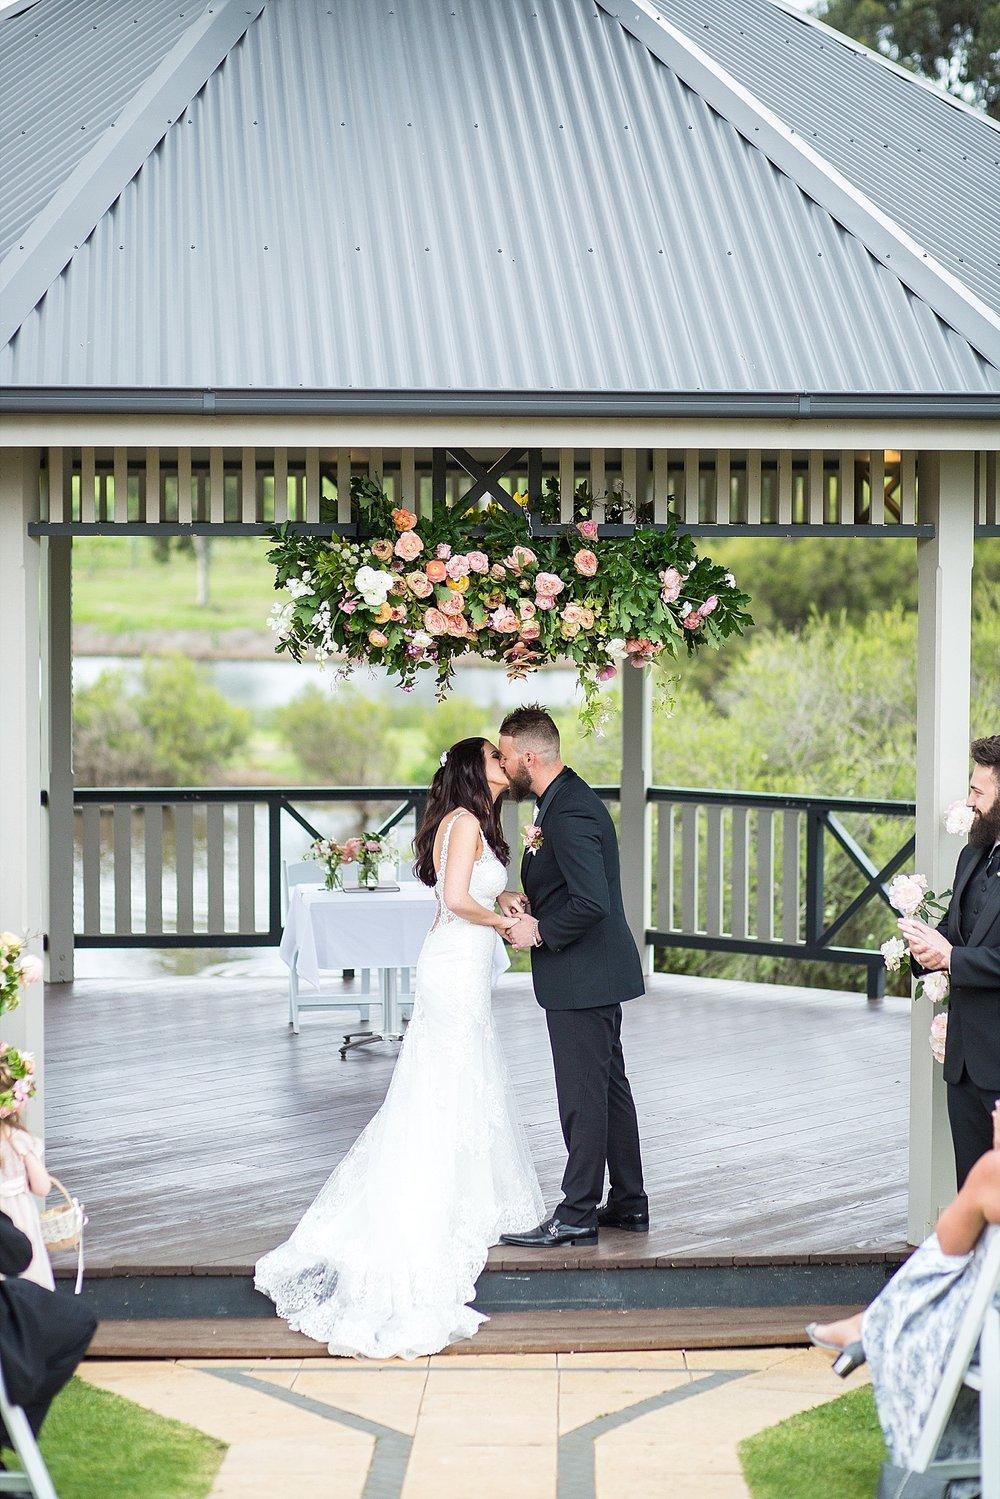 Sittella_Winery_Wedding_0017.jpg